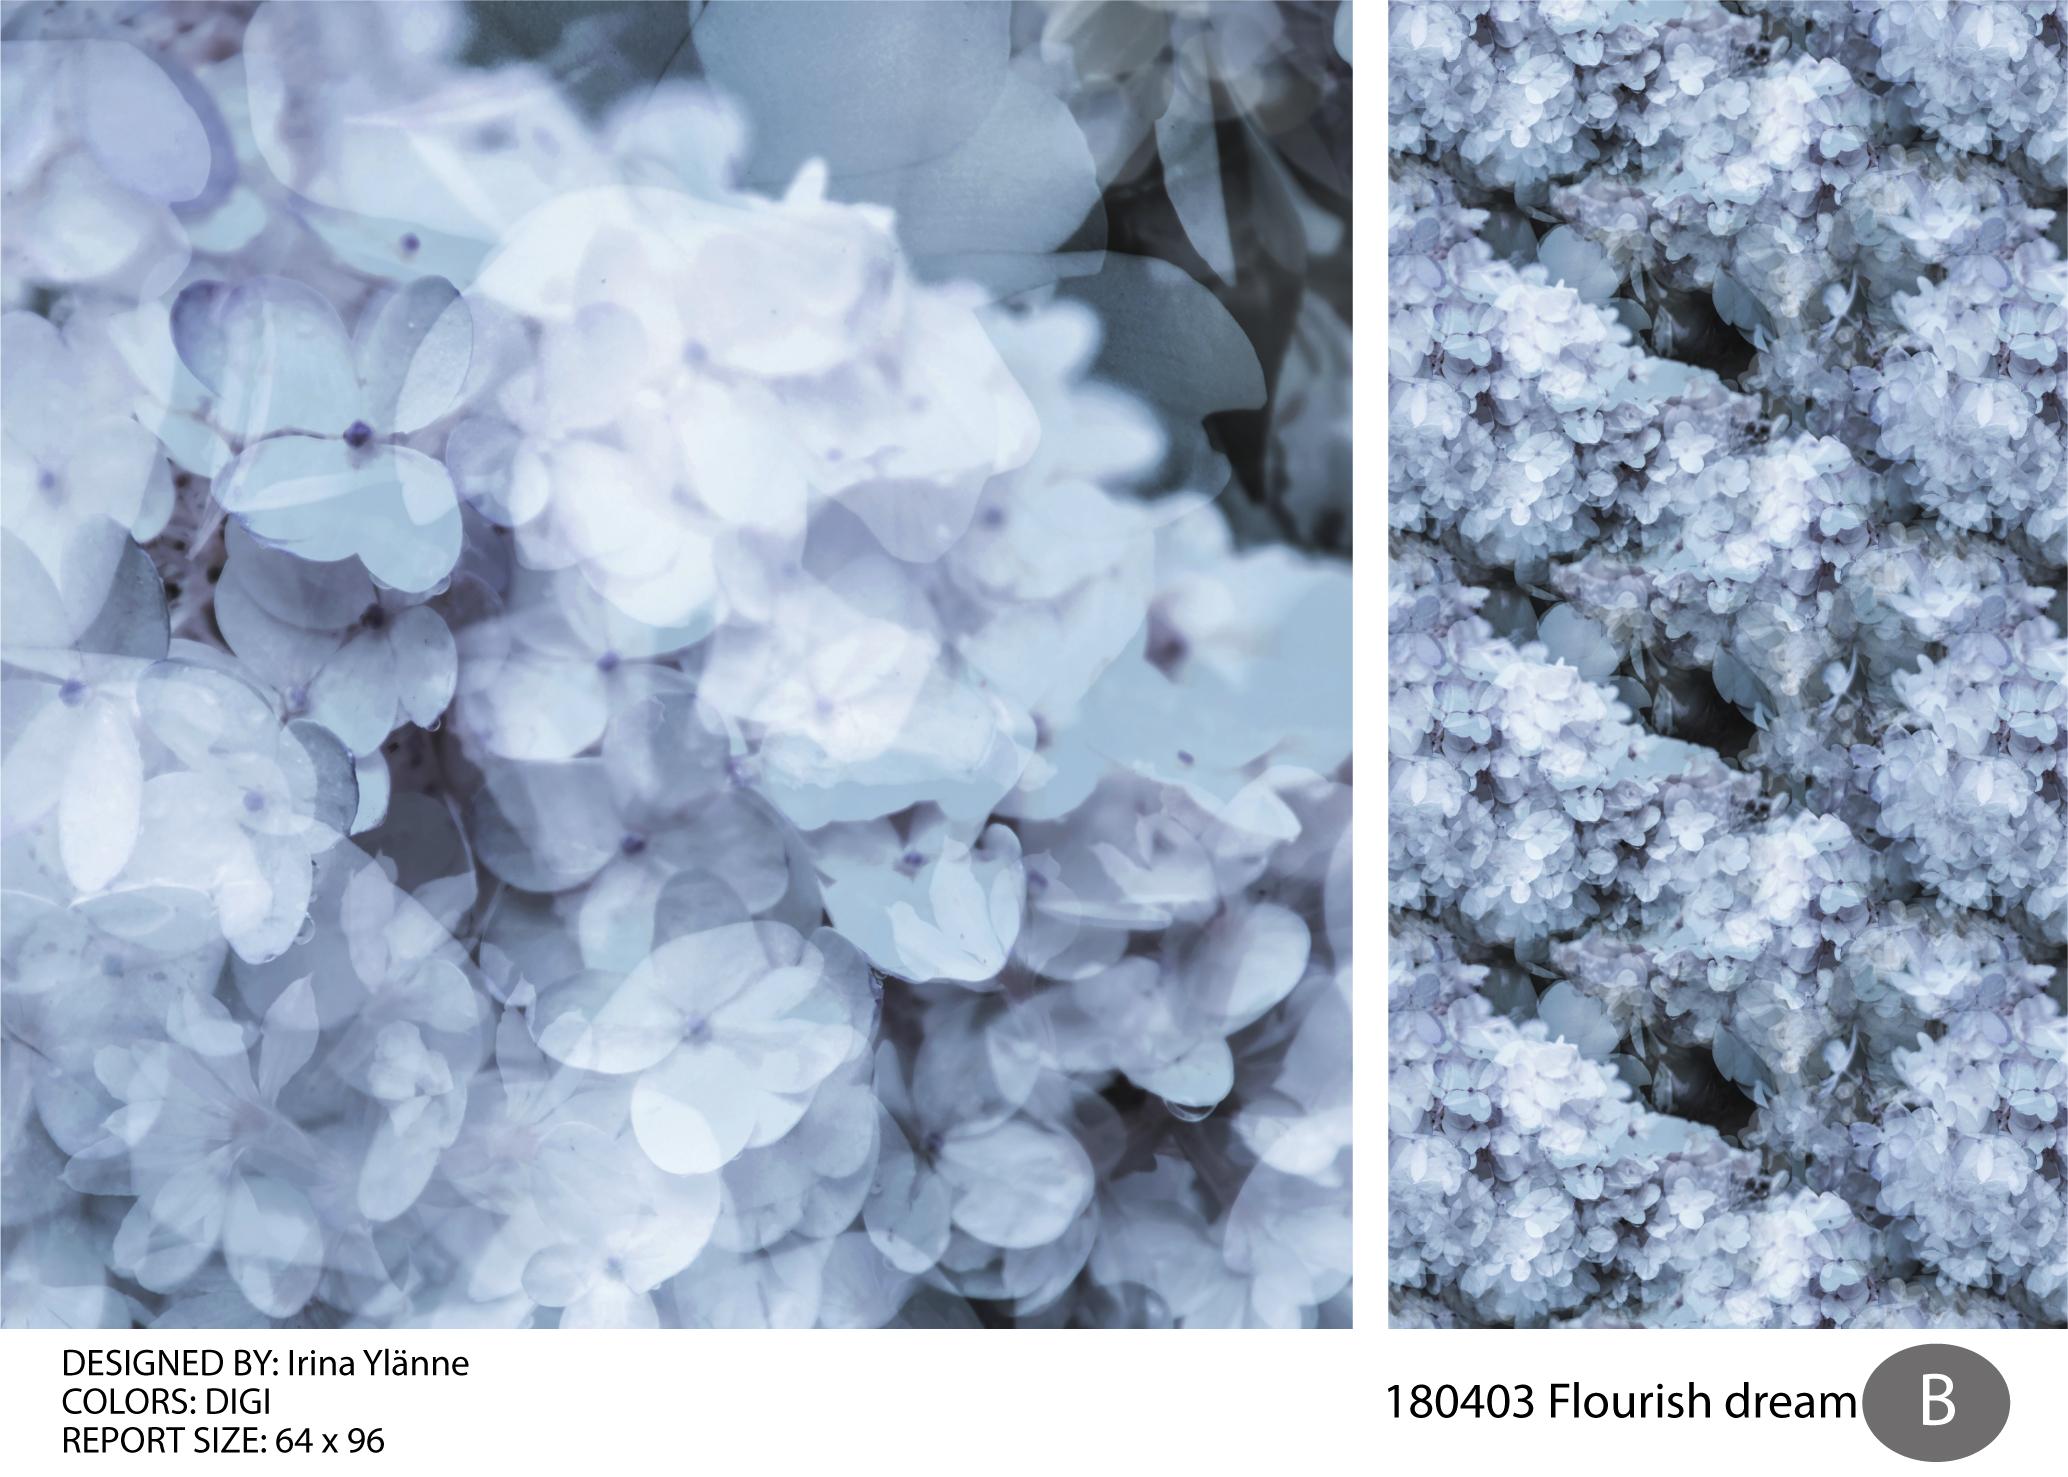 irinas_Flourish Dream_180403-02